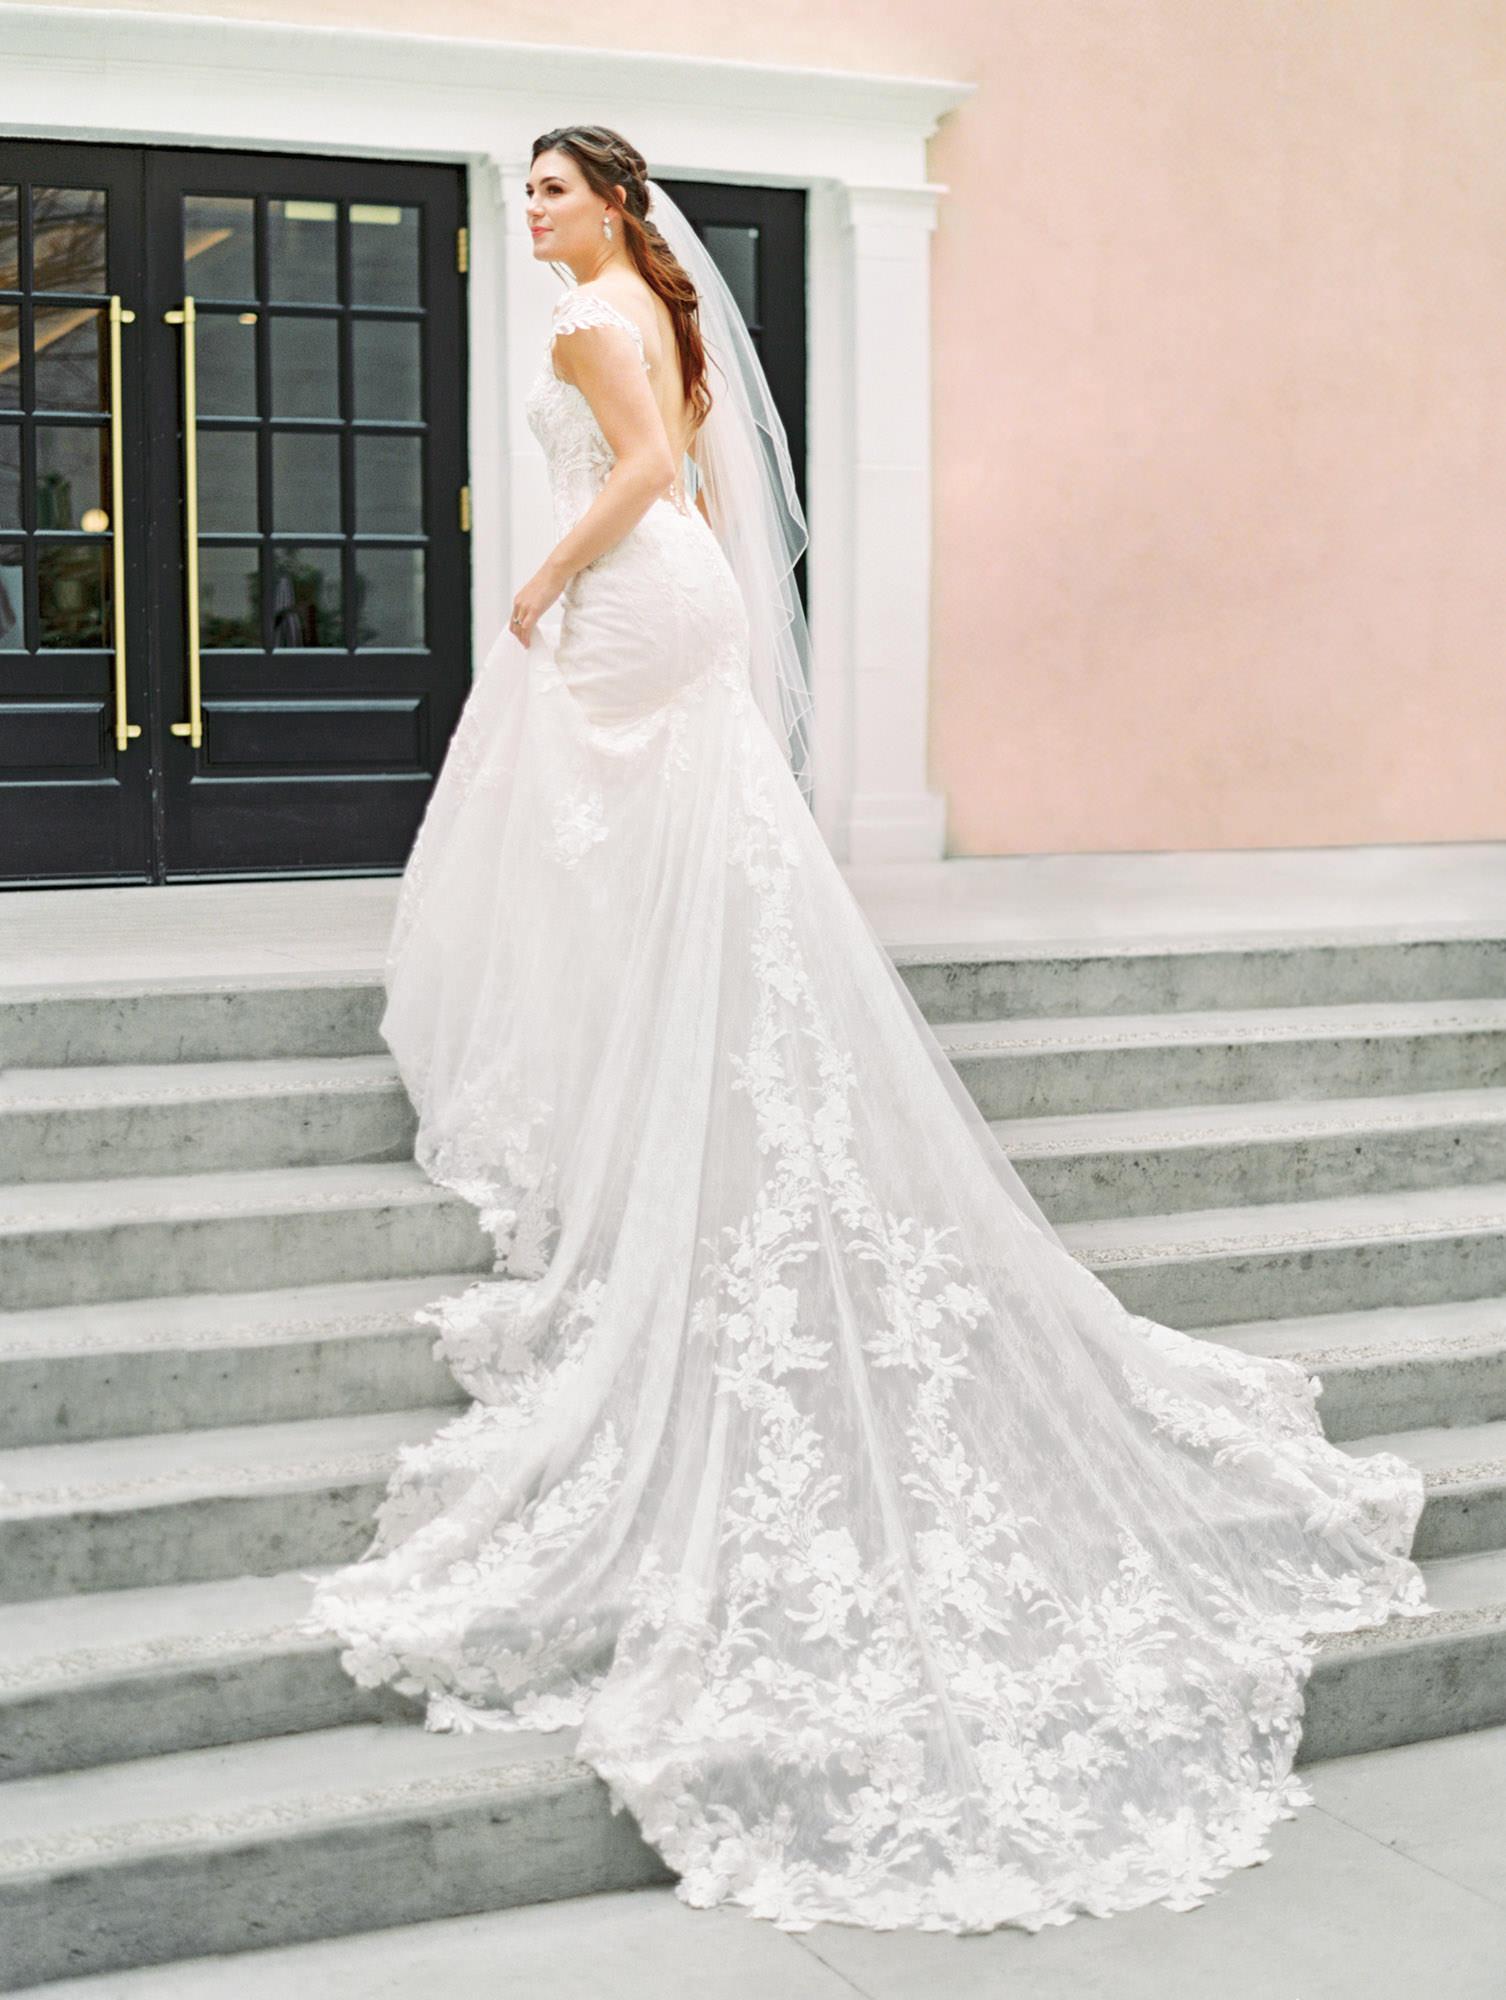 1104 cap sleeve lace dramatic drain with floral lace Martina Liana wedding dress in San Diego by Cavin Elizabeth - San Diego film photographer. Wedding Fashion Inspiration.